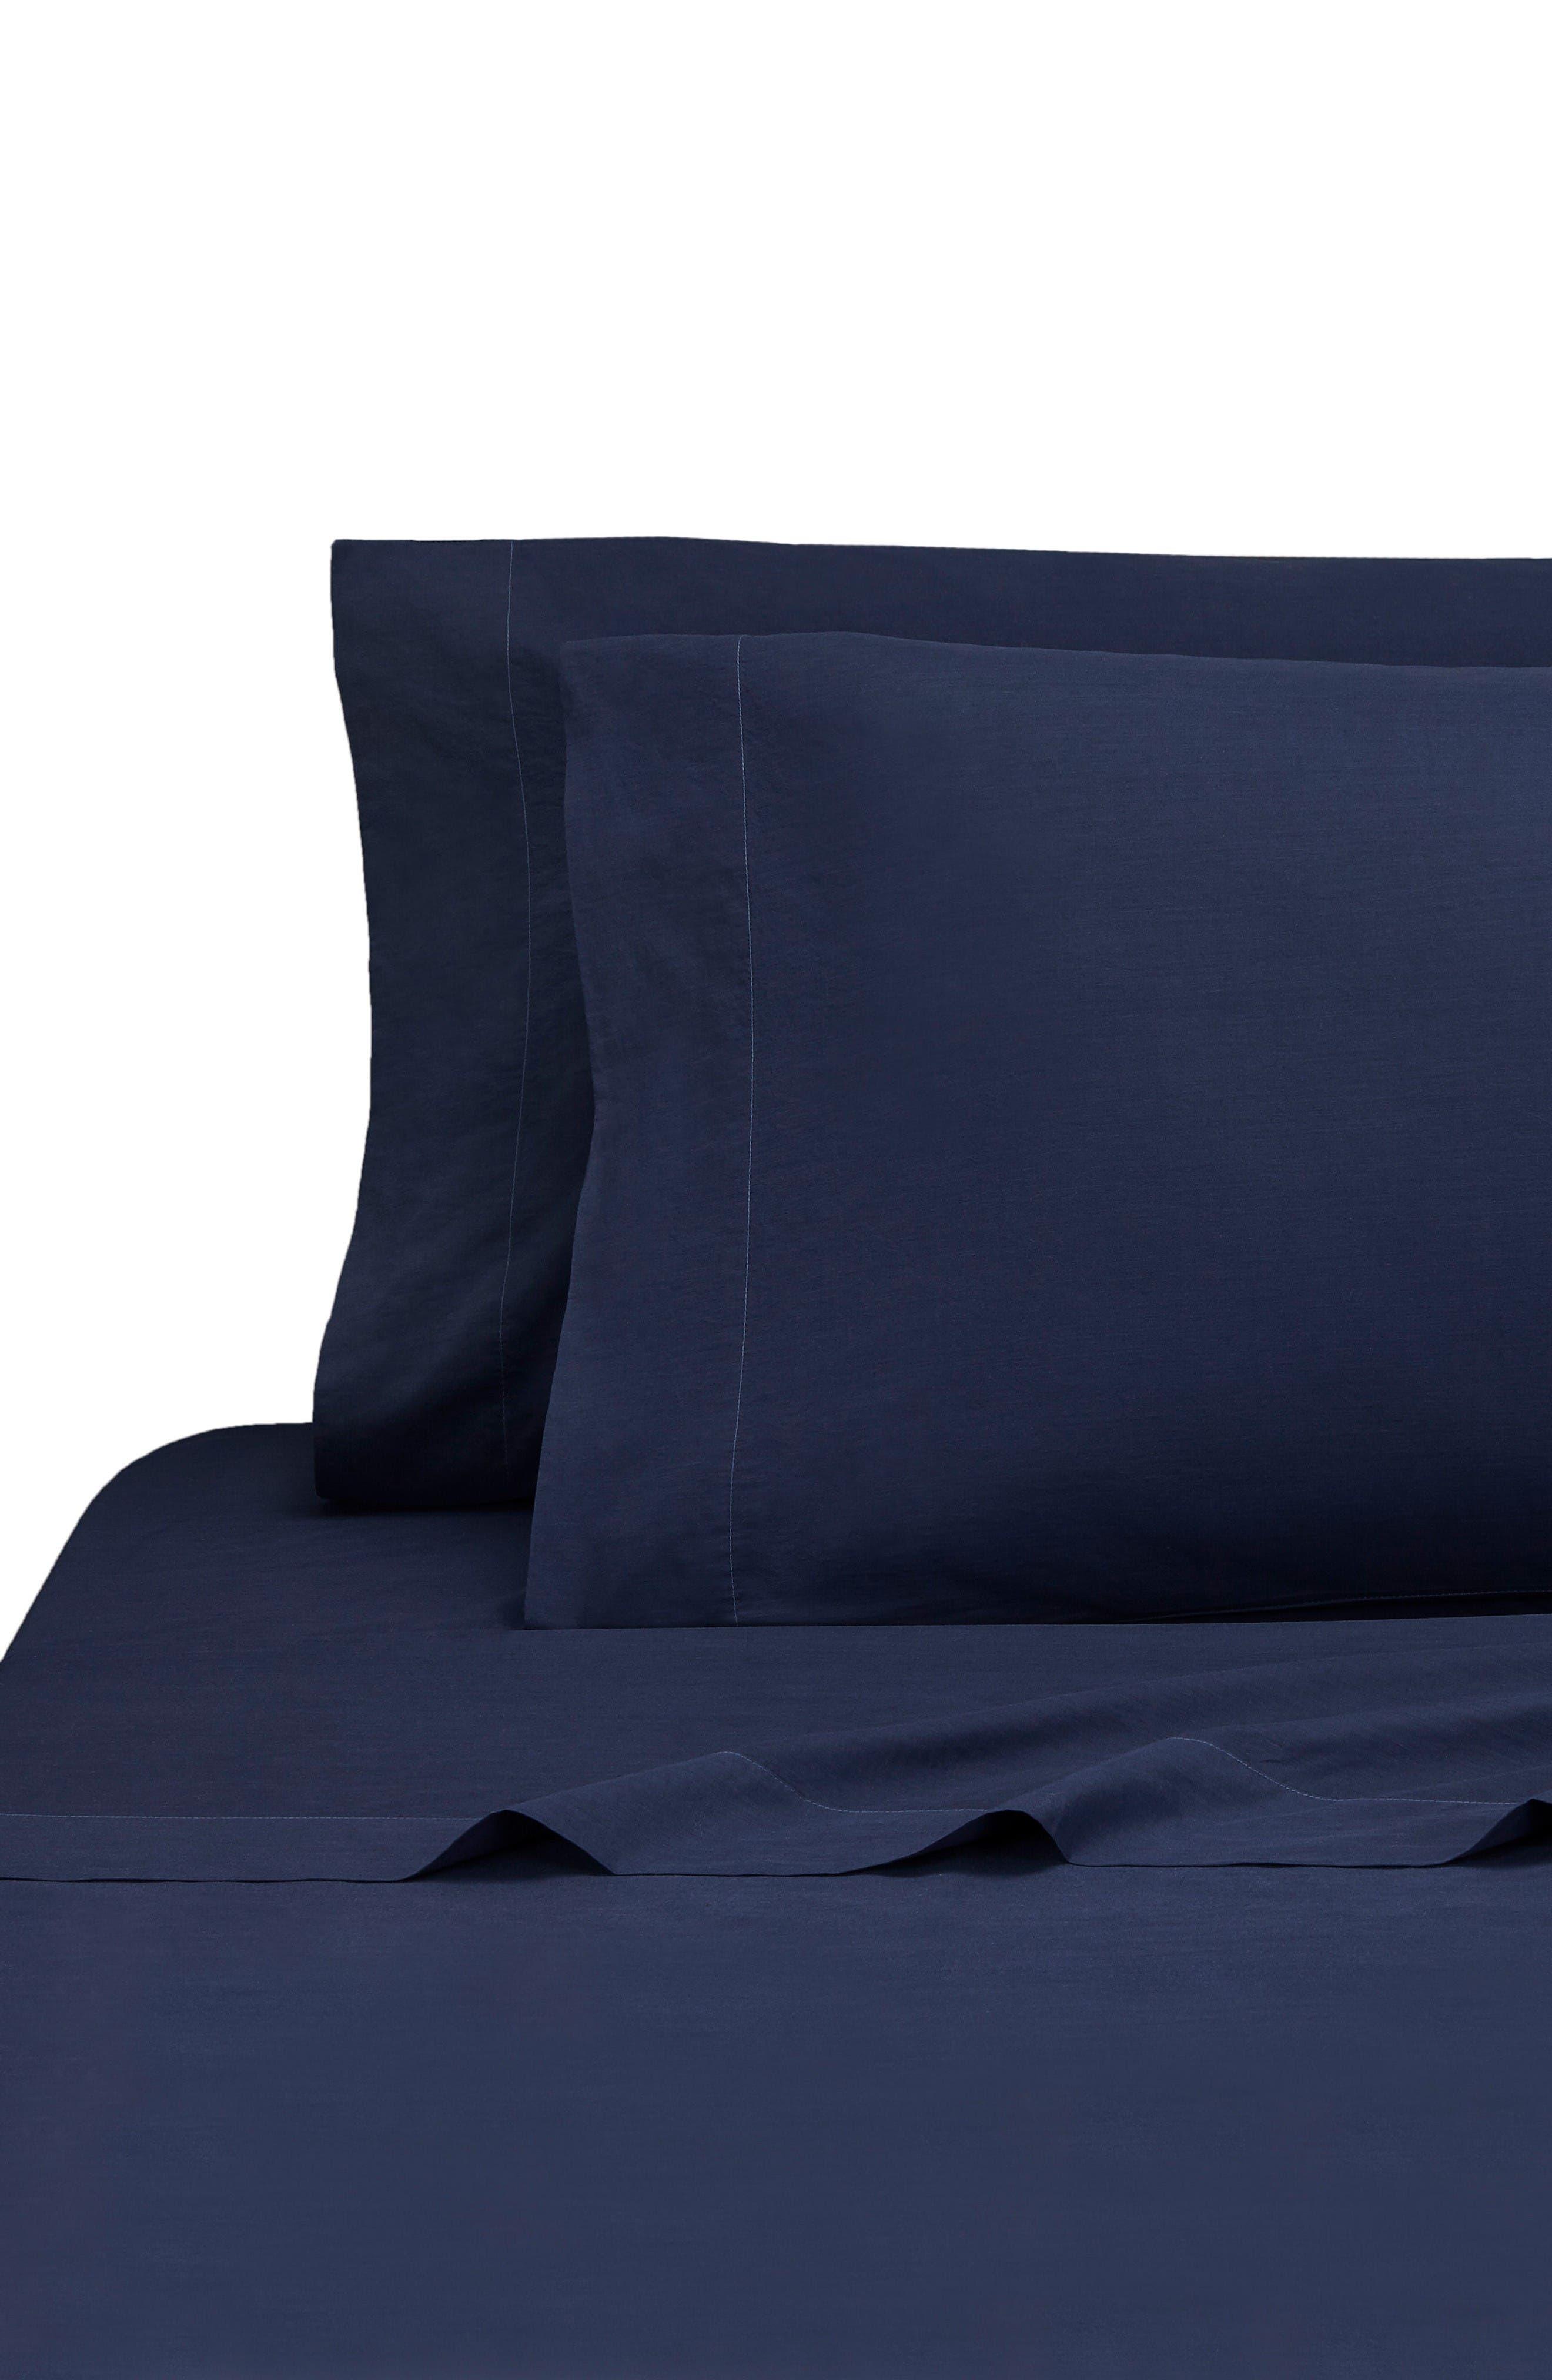 KASSATEX Lorimer Set of 2 300 Thread Count Tencel® Percale Pillowcases